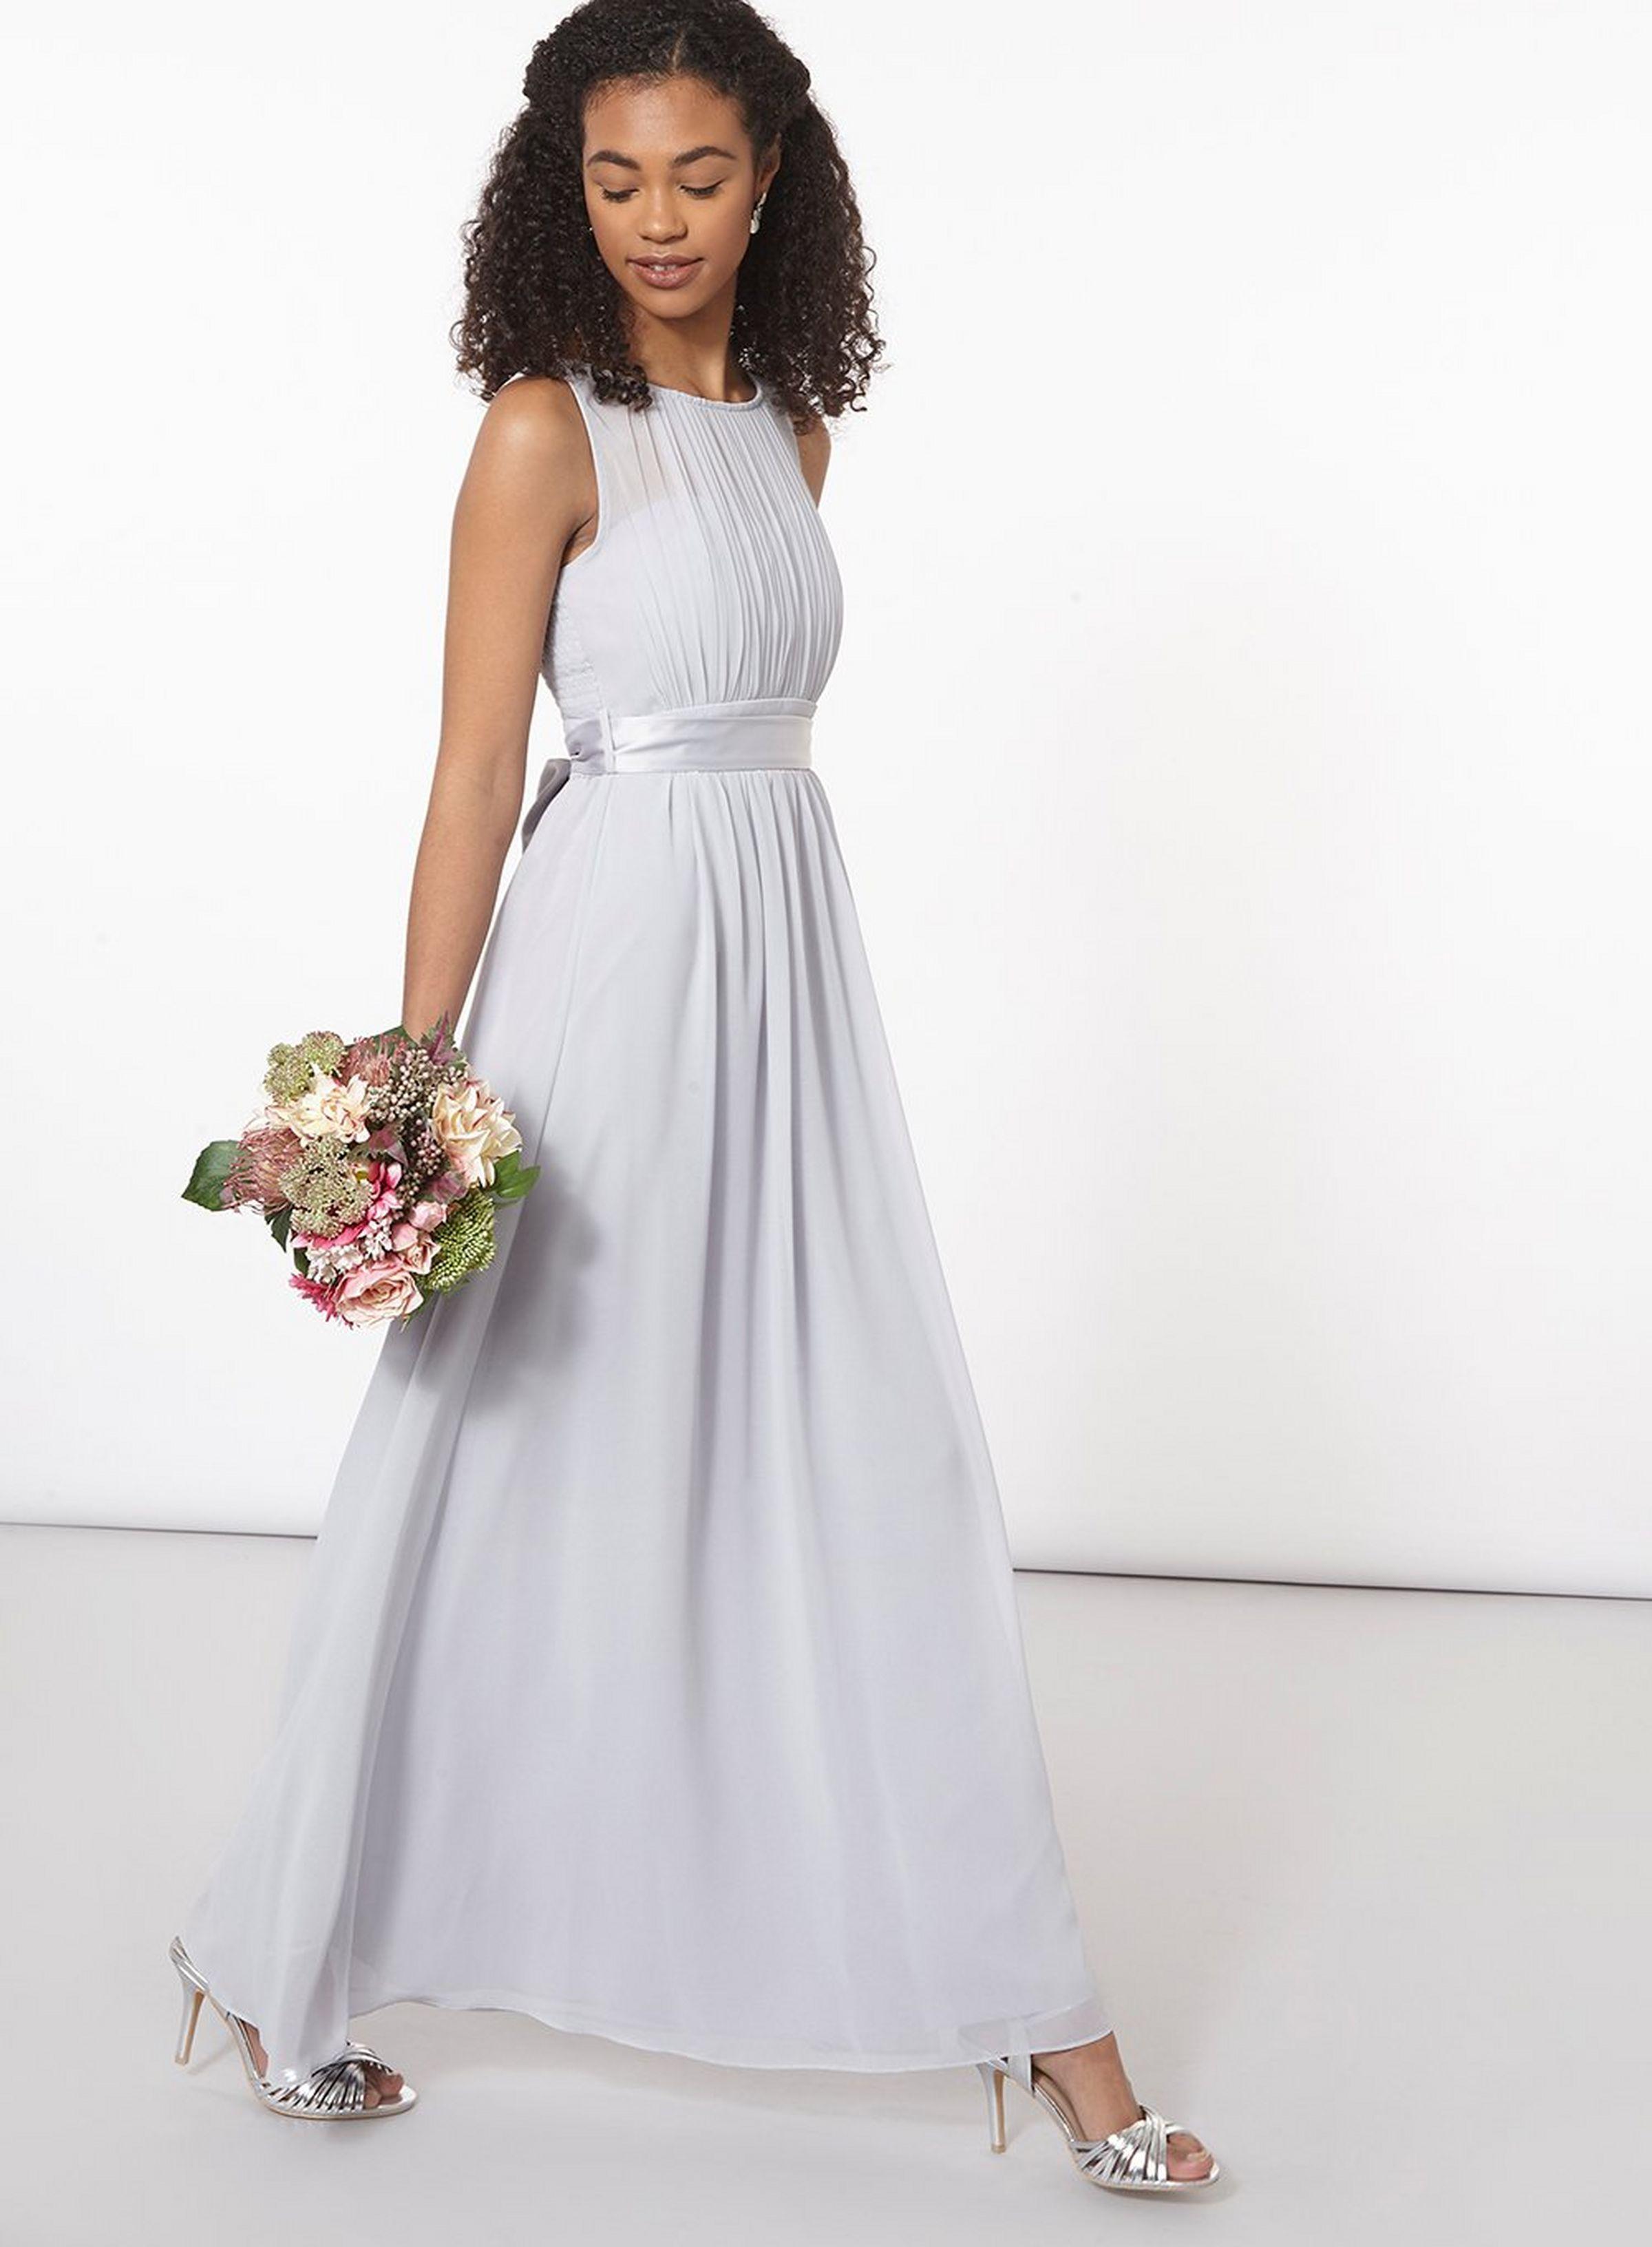 Showcase Petite Grey Natalie Bridesmaid Maxi Dress Petite Bridesmaids Dresses Grey Bridesmaid Dresses Maxi Bridesmaid Dresses